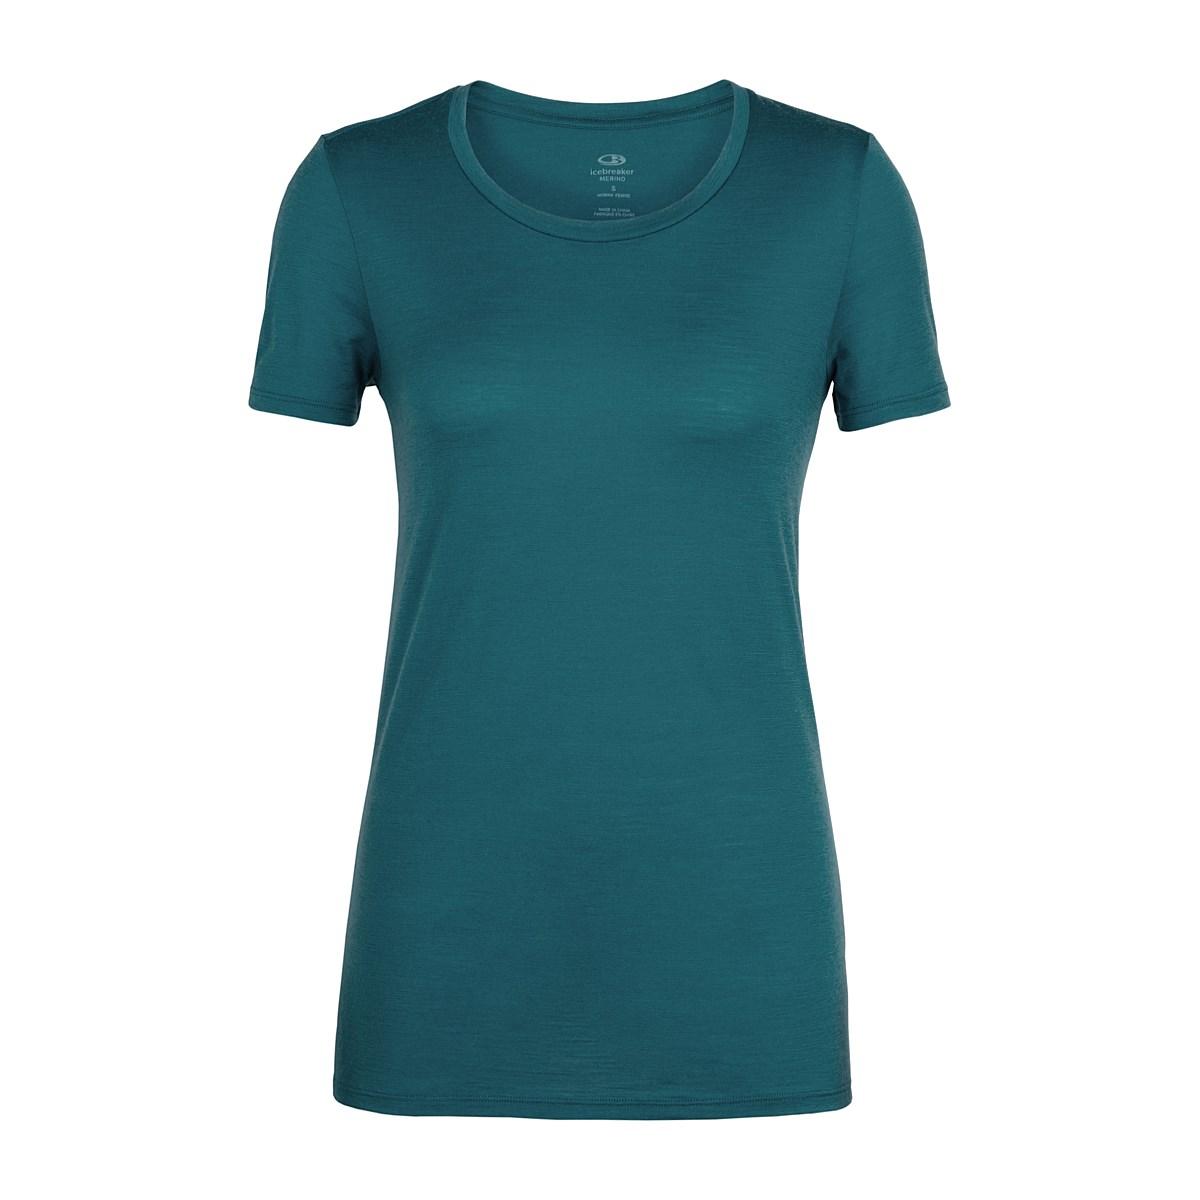 225a62496 Womens - Icebreaker Women's Tech Lite Short Sleeve Low Crewe